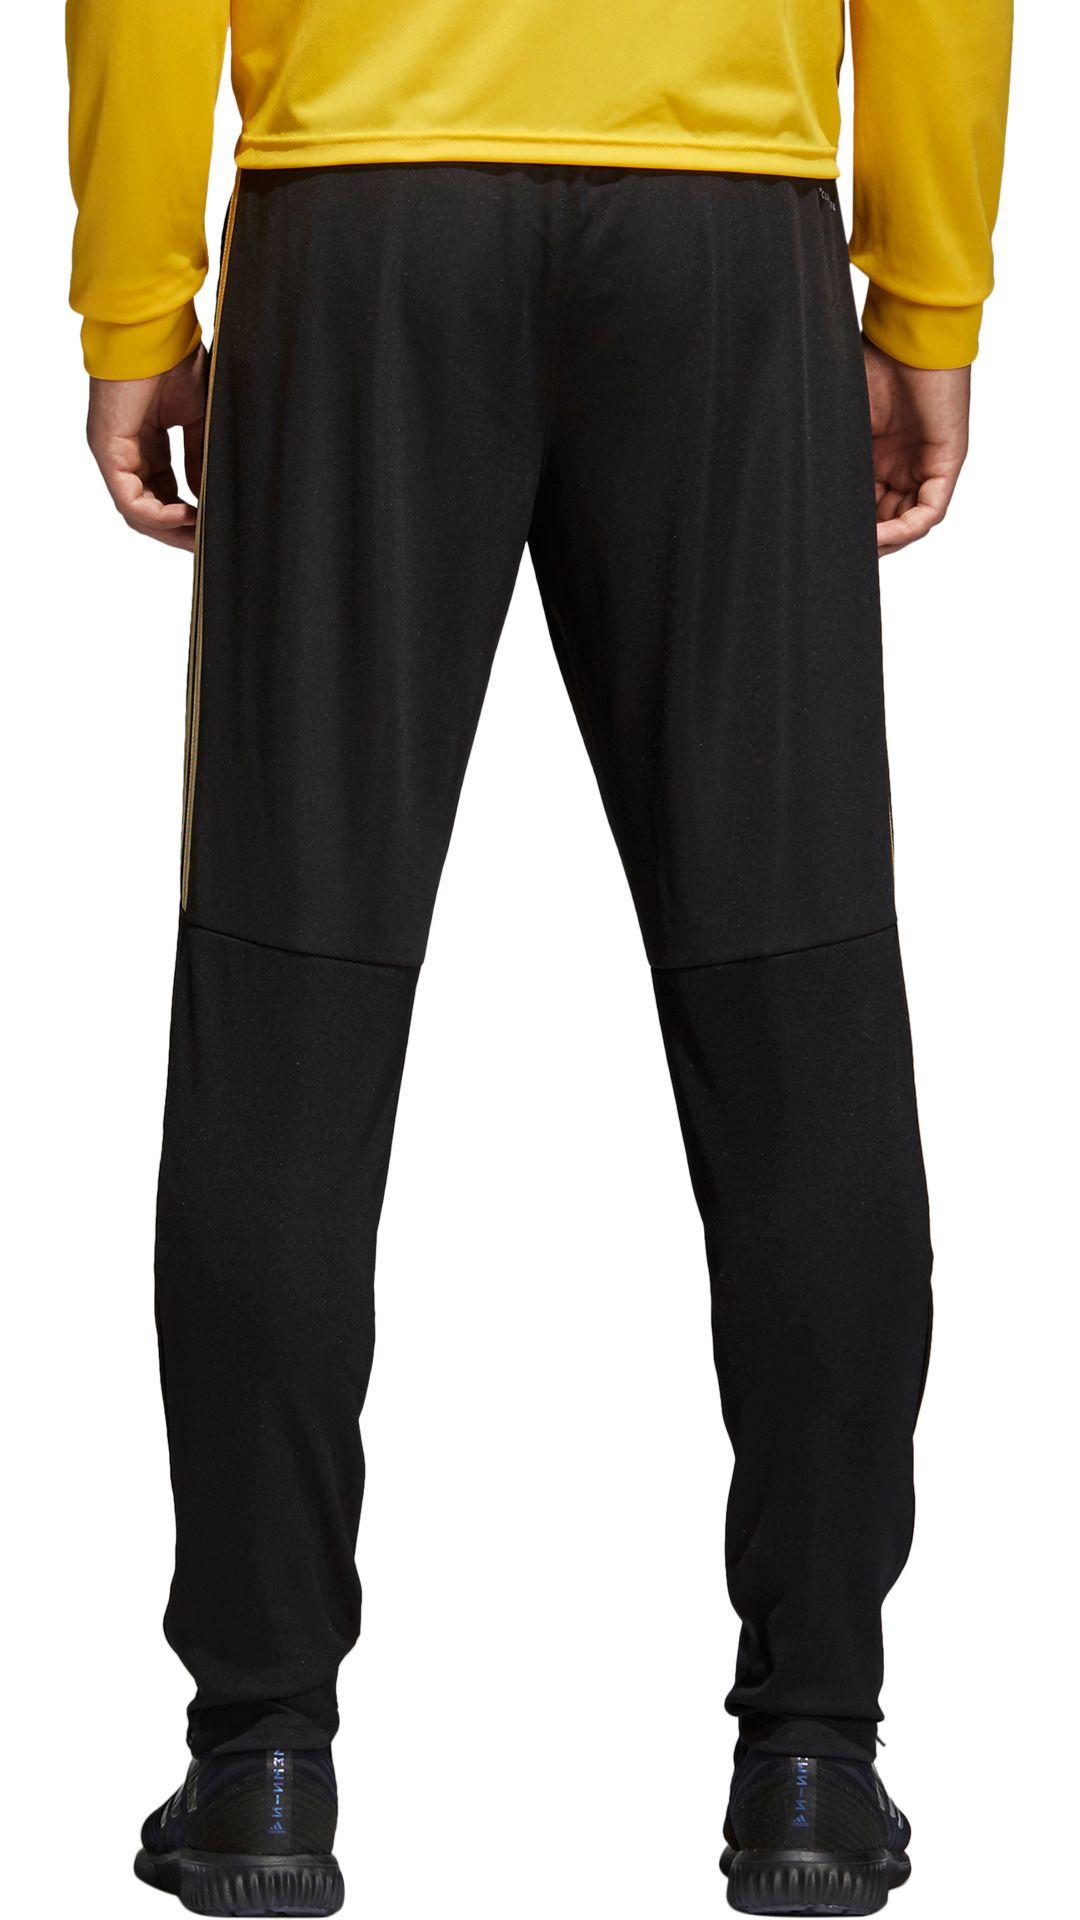 91e6b50eb adidas Men's Tiro 17 Metallic Training Pants | DICK'S Sporting Goods